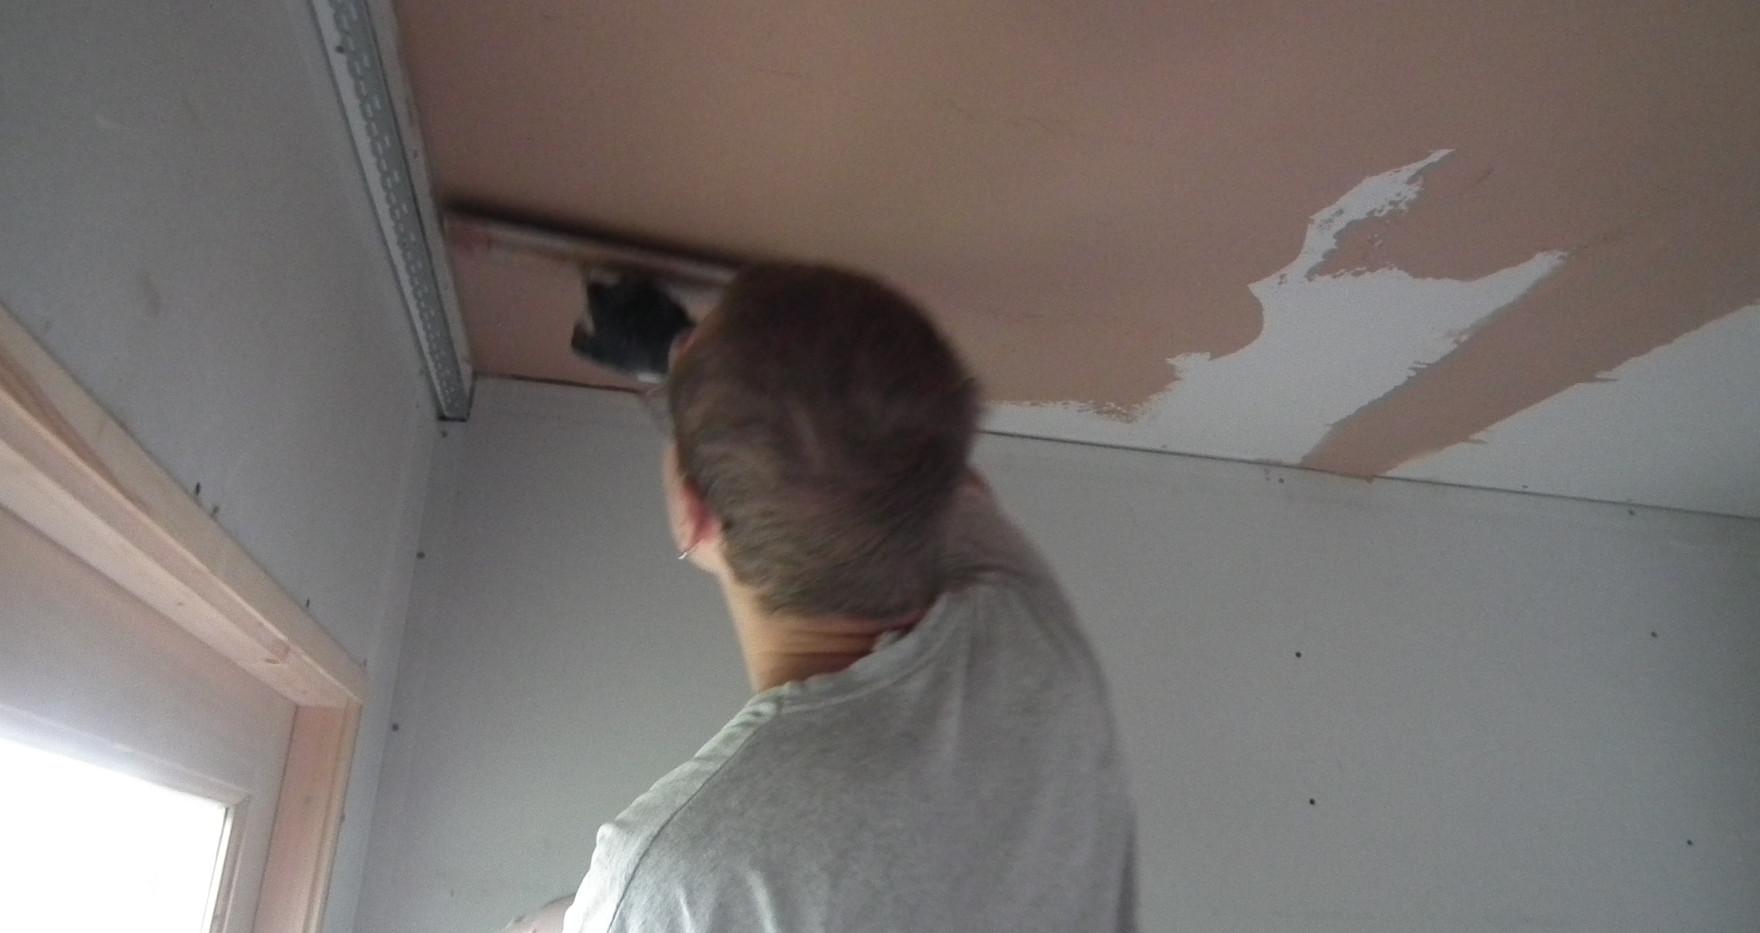 Starting to plaster